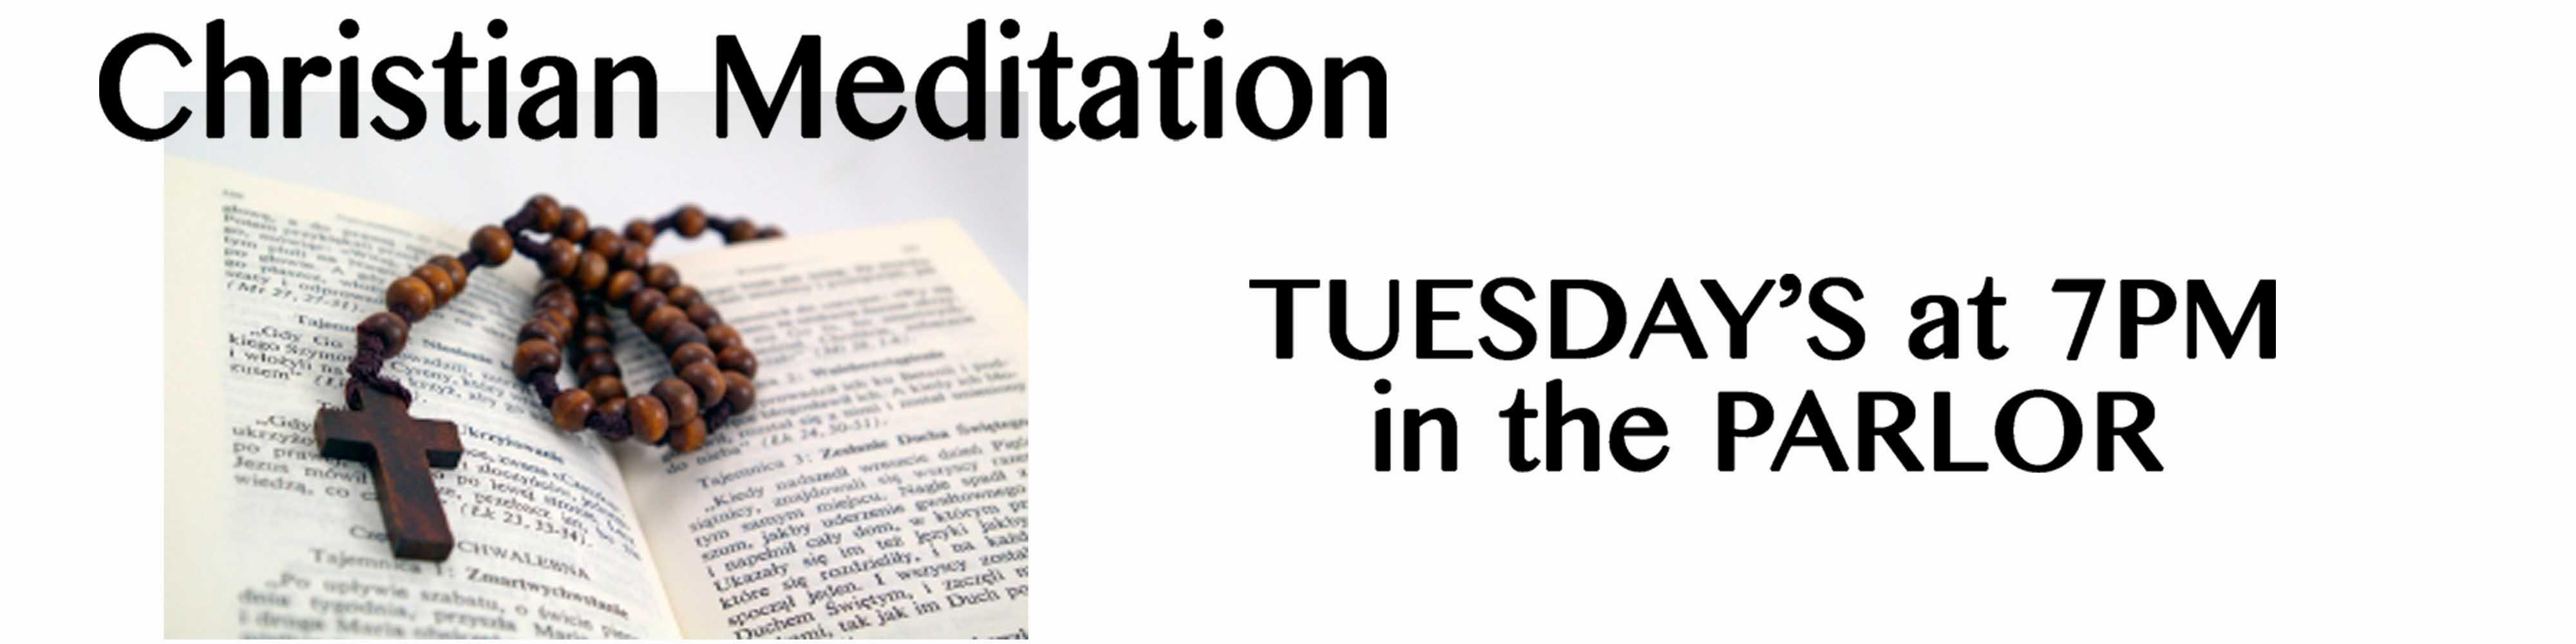 christian meditation_banner